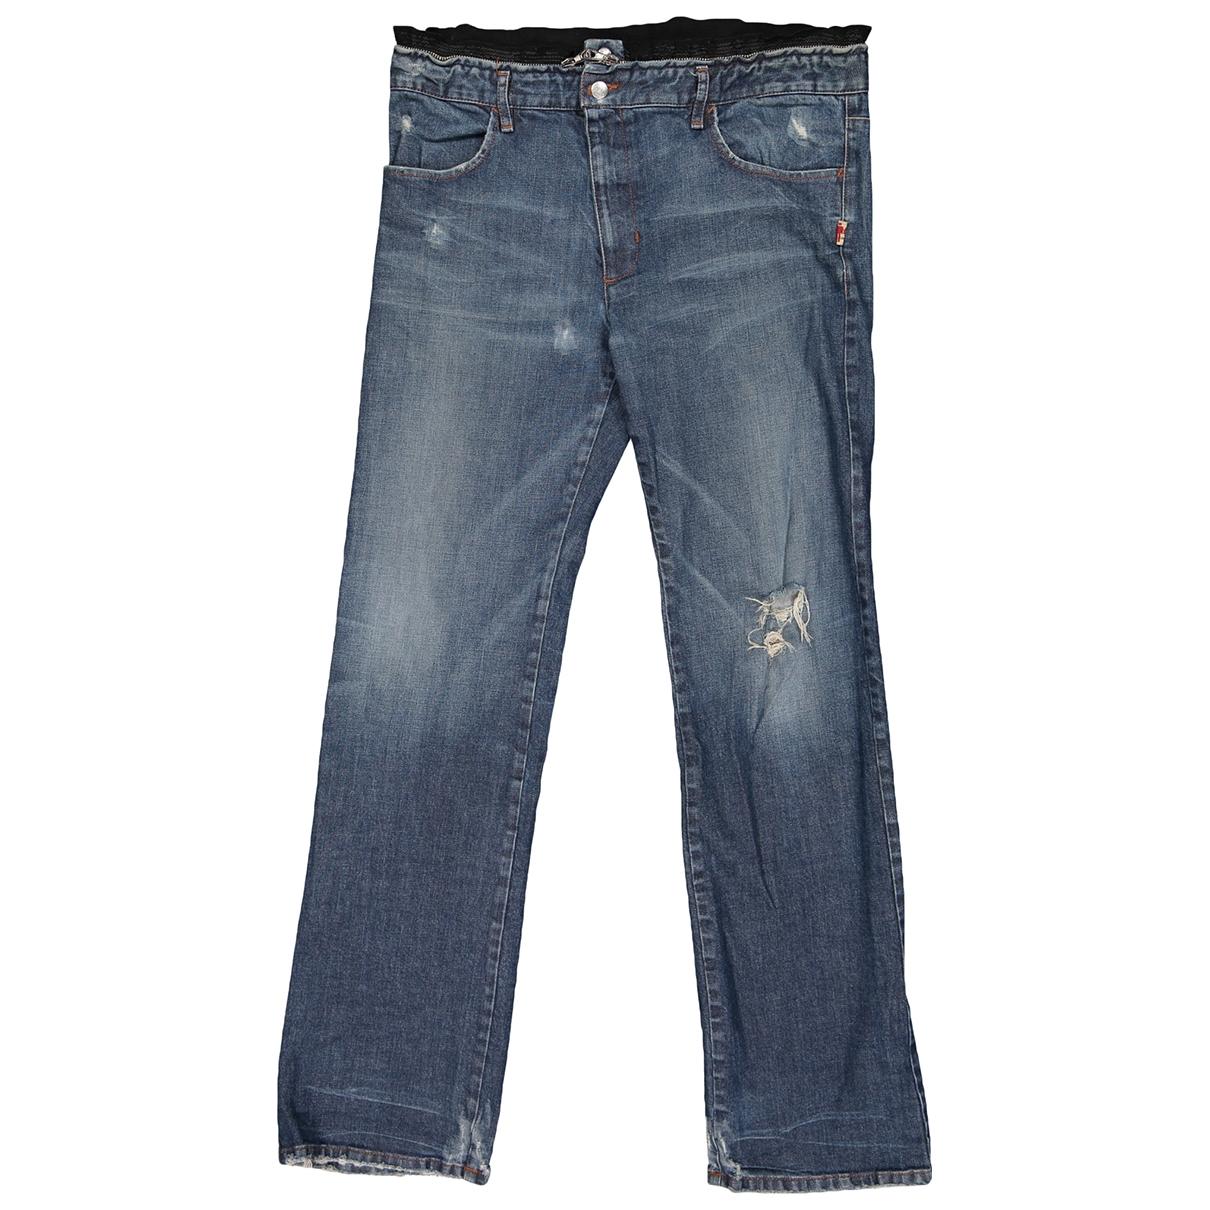 Jean Paul Gaultier \N Blue Cotton - elasthane Jeans for Men 44 FR